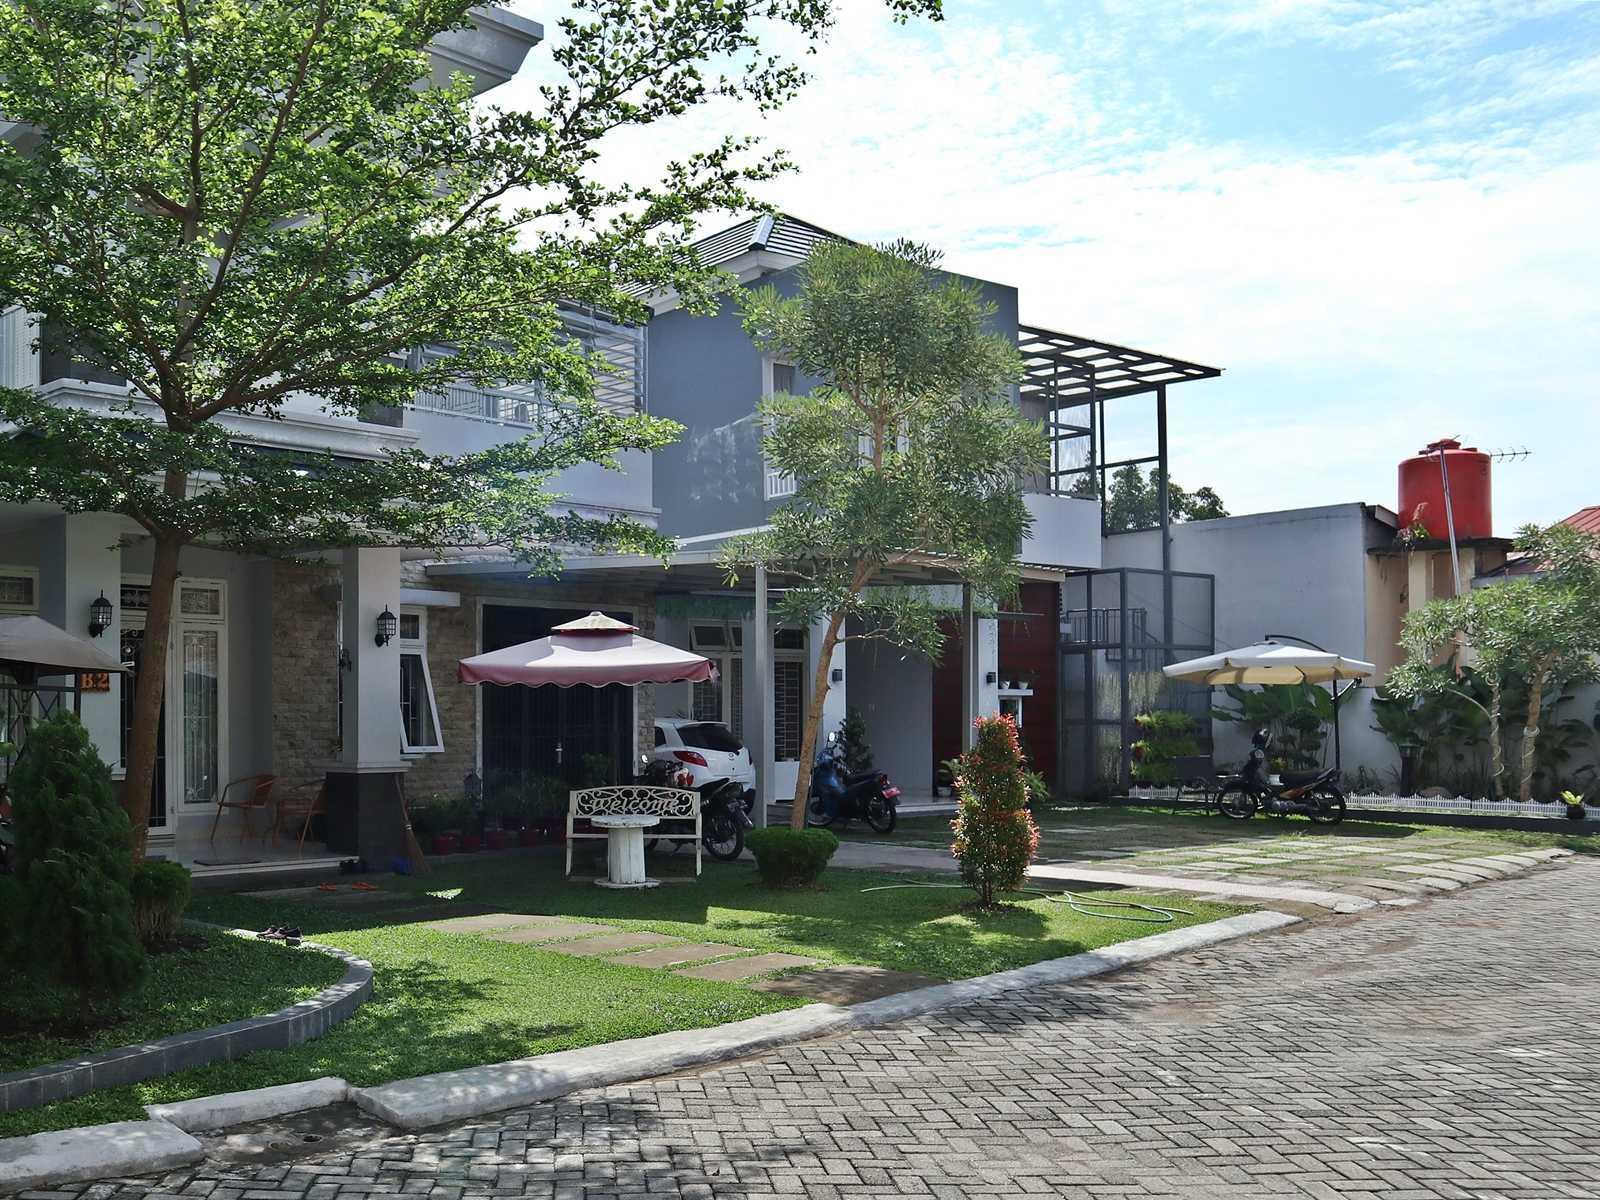 Bd Studio Ds House Medan, Kota Medan, Sumatera Utara, Indonesia Medan, Kota Medan, Sumatera Utara, Indonesia Bd-Studio-Ds-House  73822